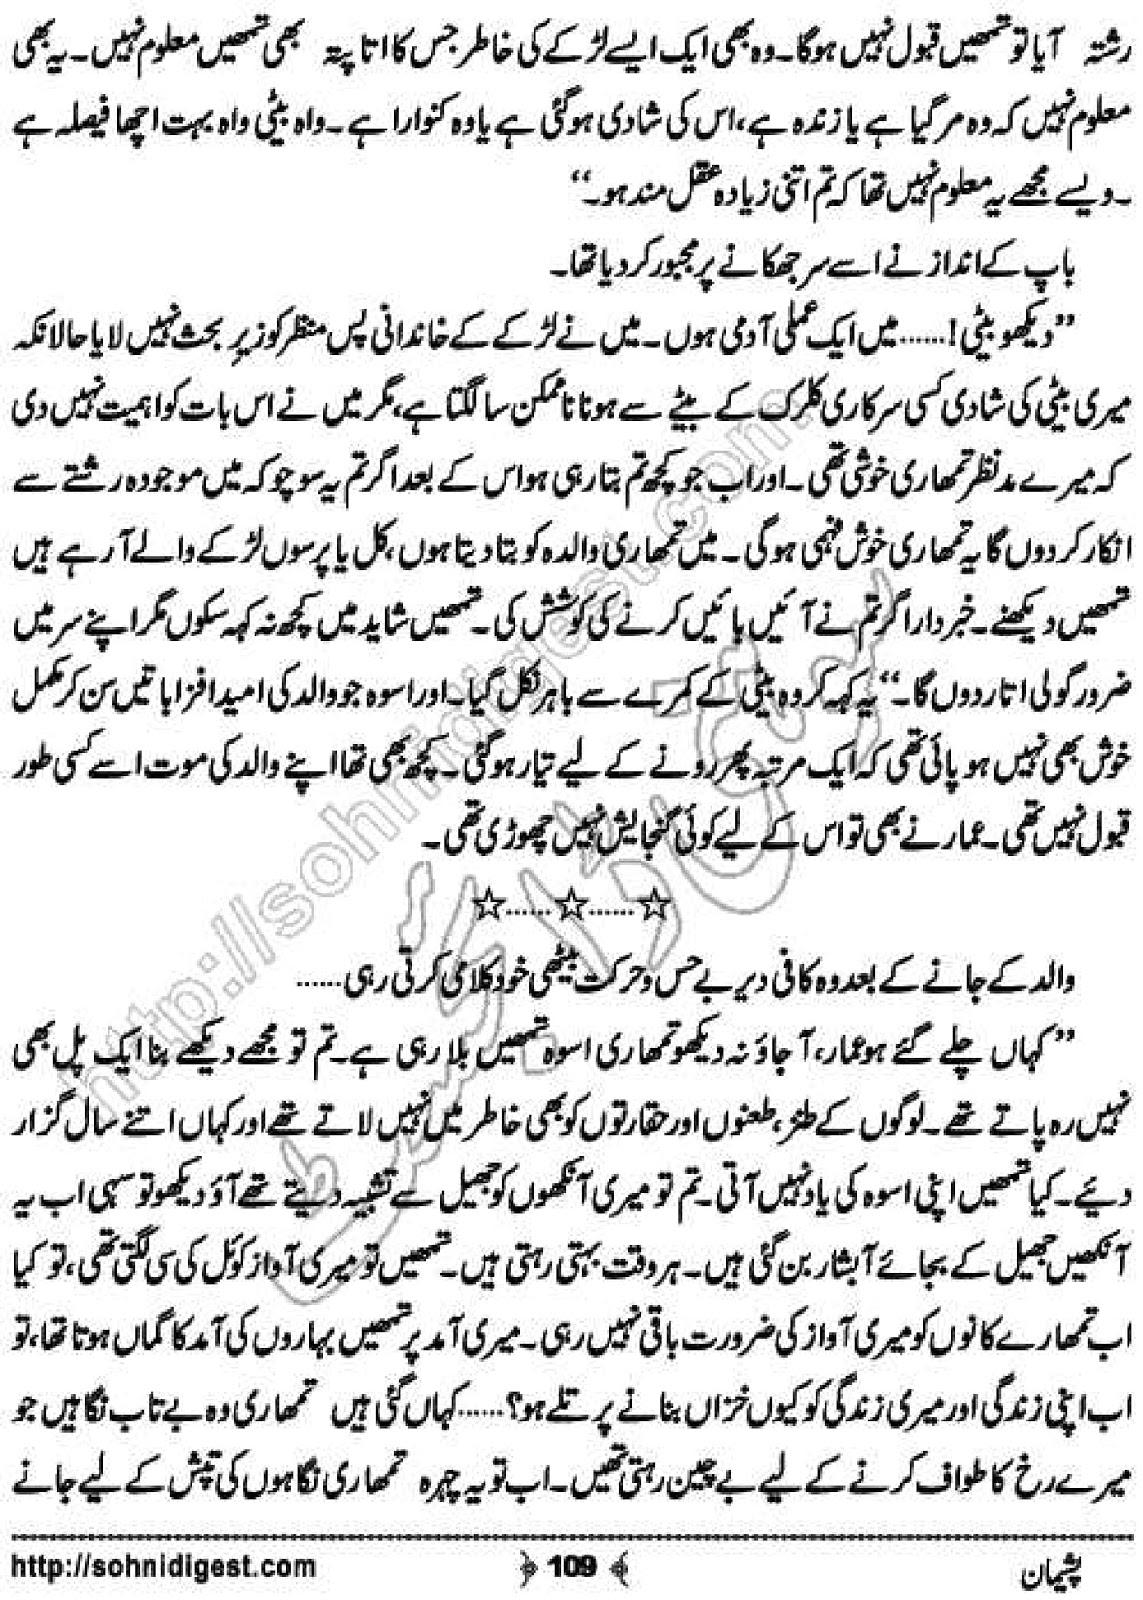 EZ Readings: Pasheman novel by Riaz Aqib Kohler